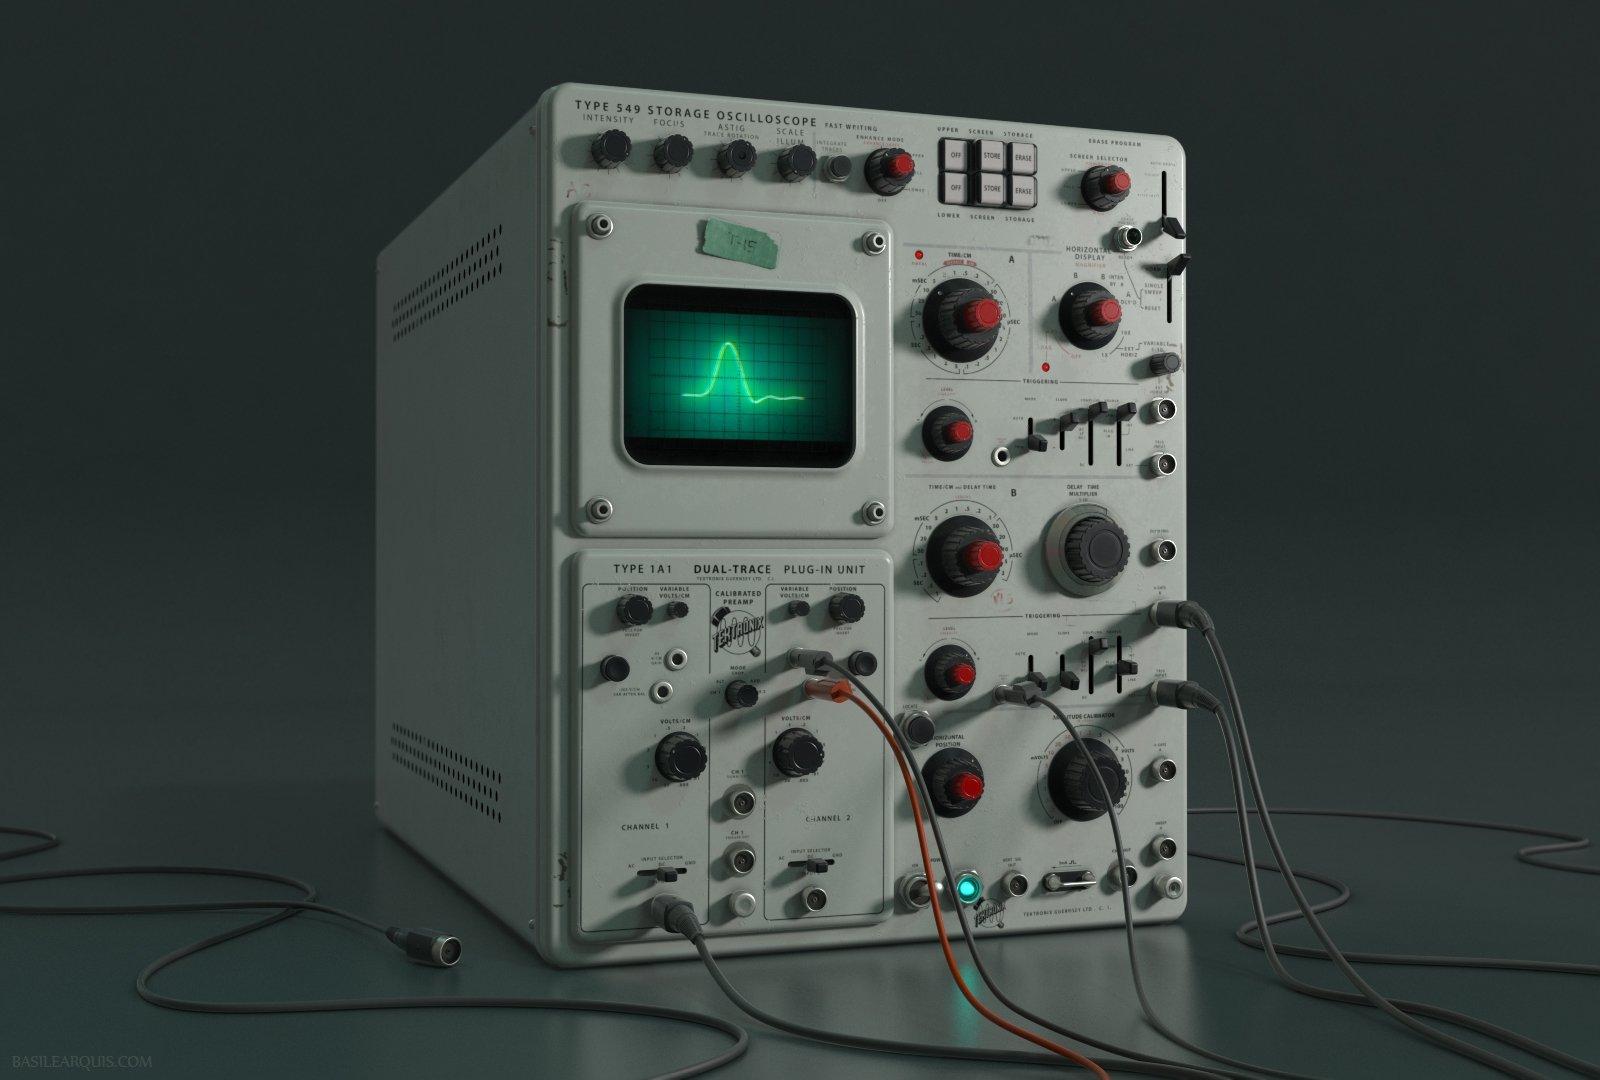 Old Oscilloscope Screen : Wip oscilloscope — polycount